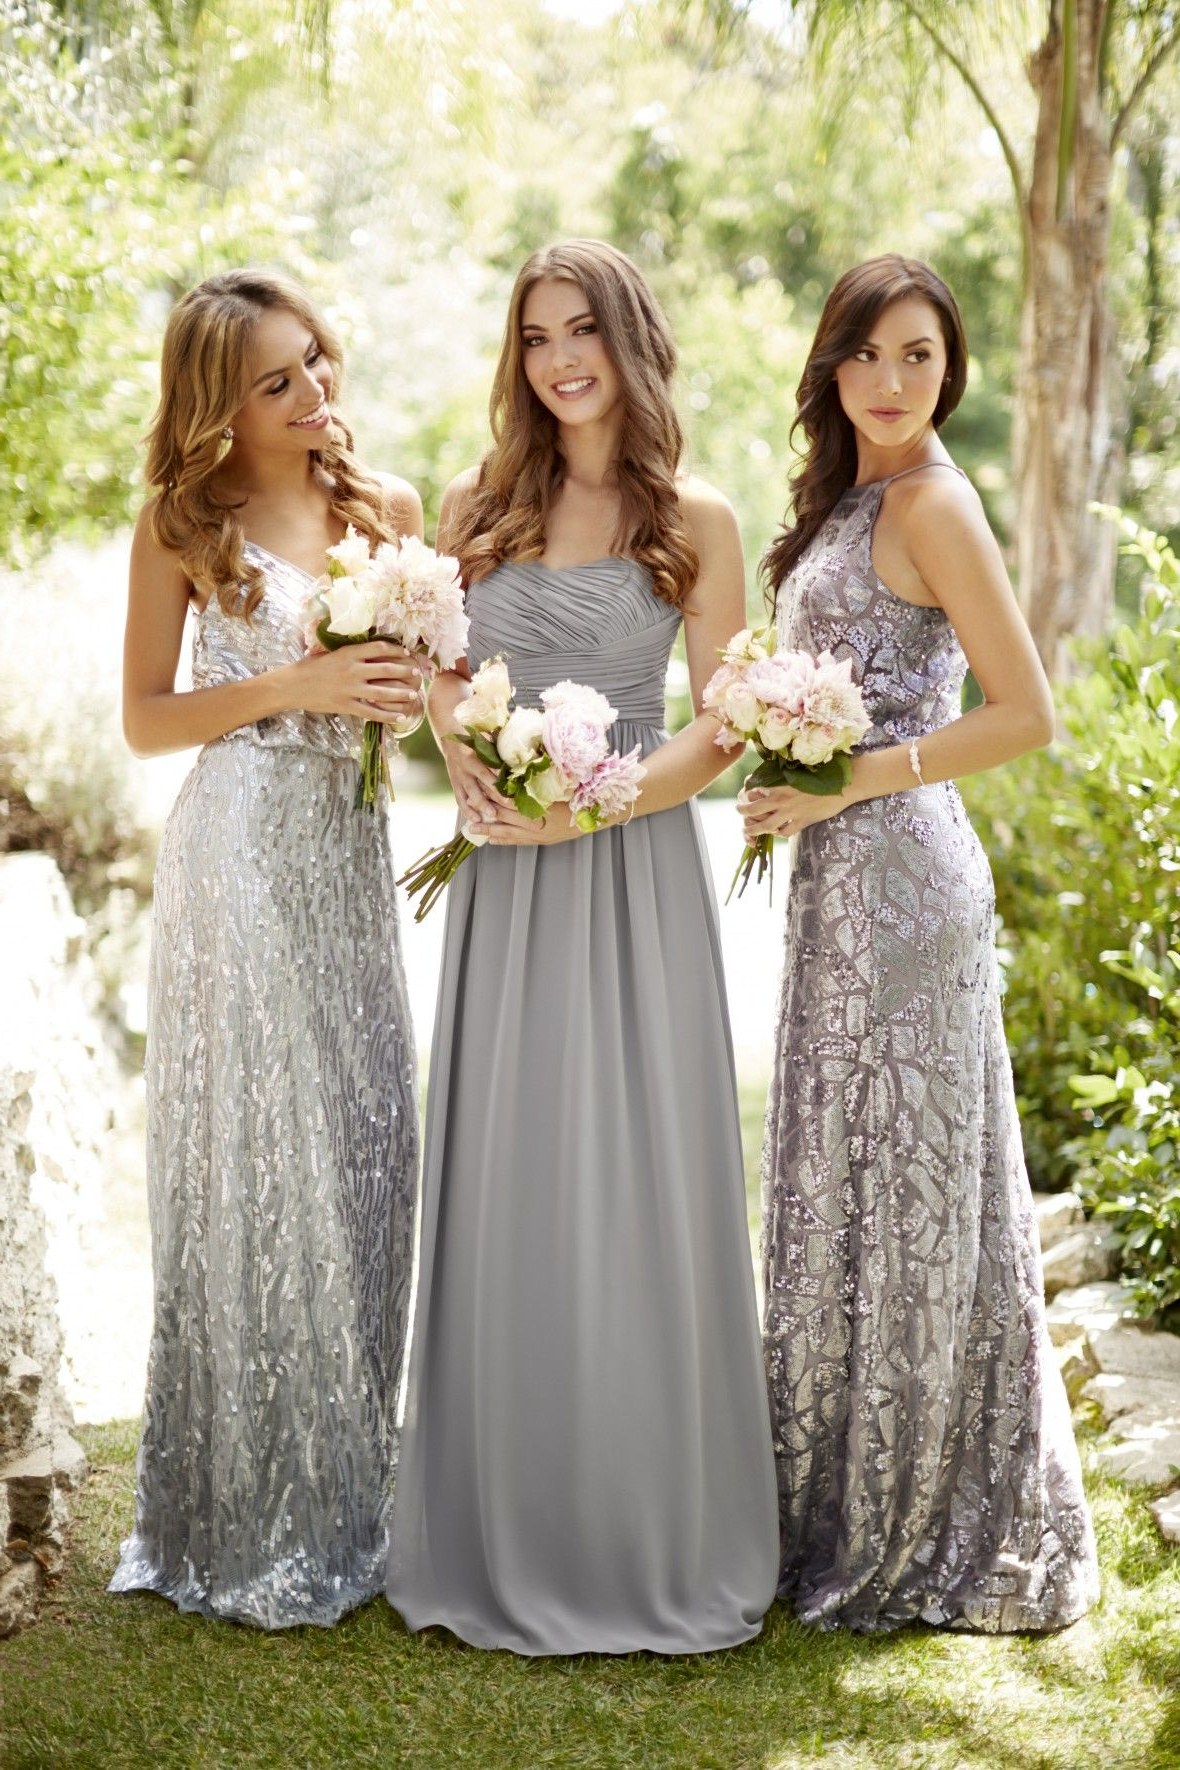 Inspirasi Desain Bridesmaid Hijab O2d5 Rent Gorgeous Designer Bridesmaids Dresses From Vow to Be